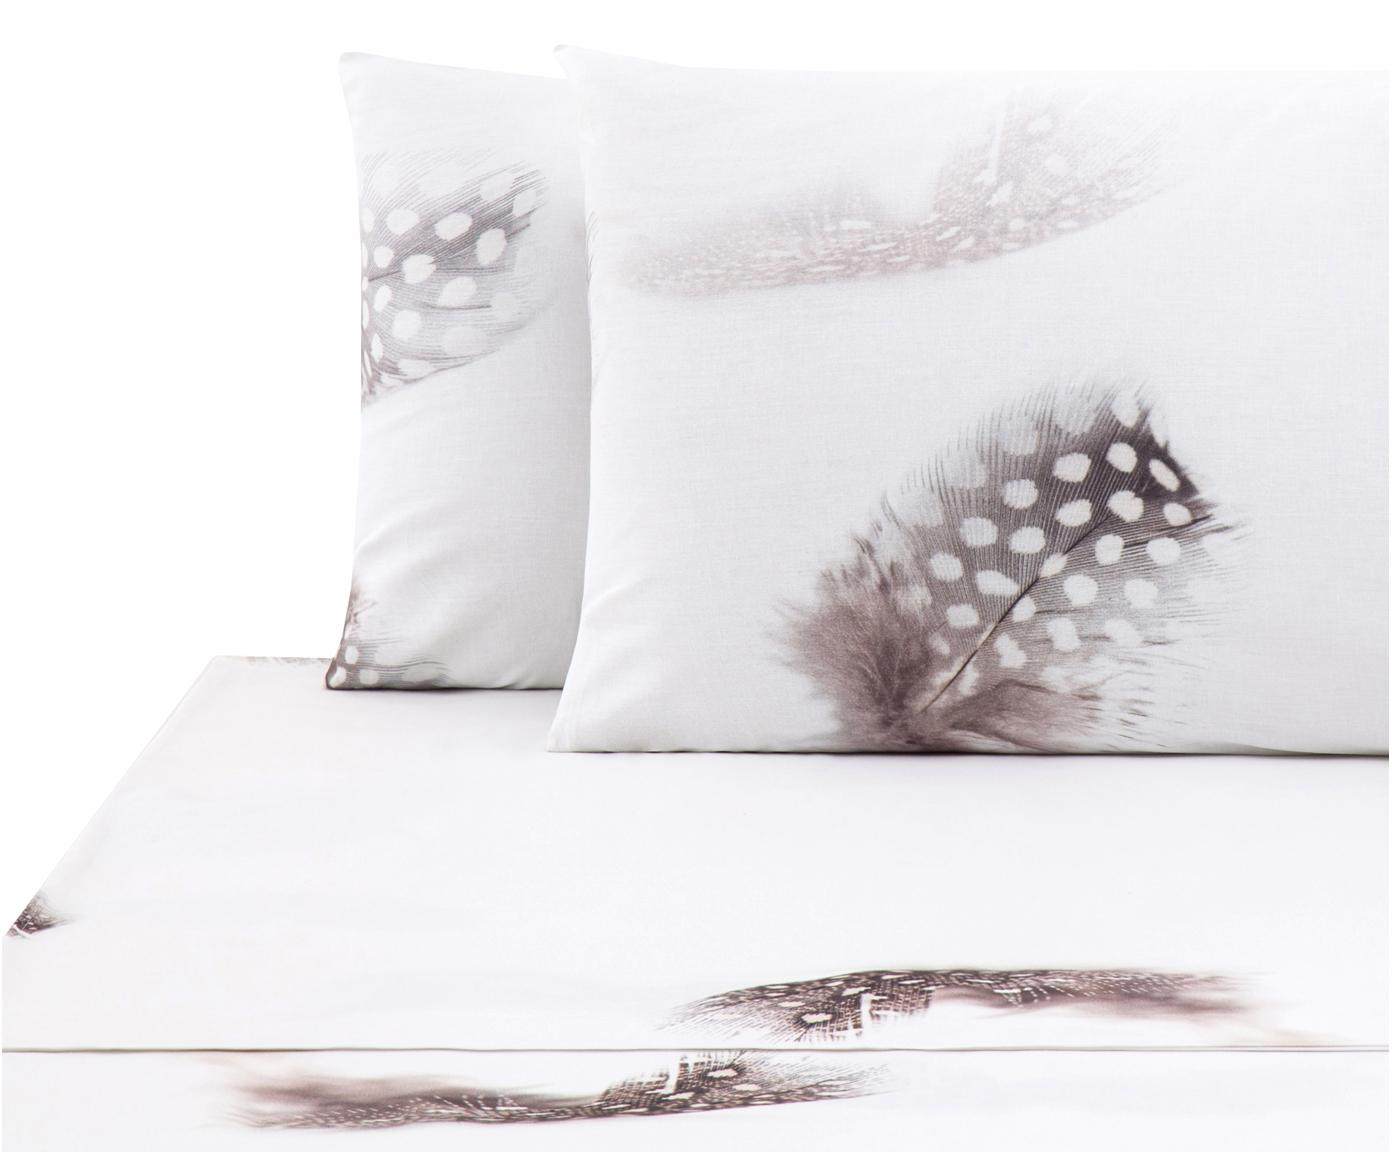 Set lenzuola in cotone ranforce Light 3 pz, Tessuto: Renforcé, Bianco, marrone, grigio, 240 x 270 cm